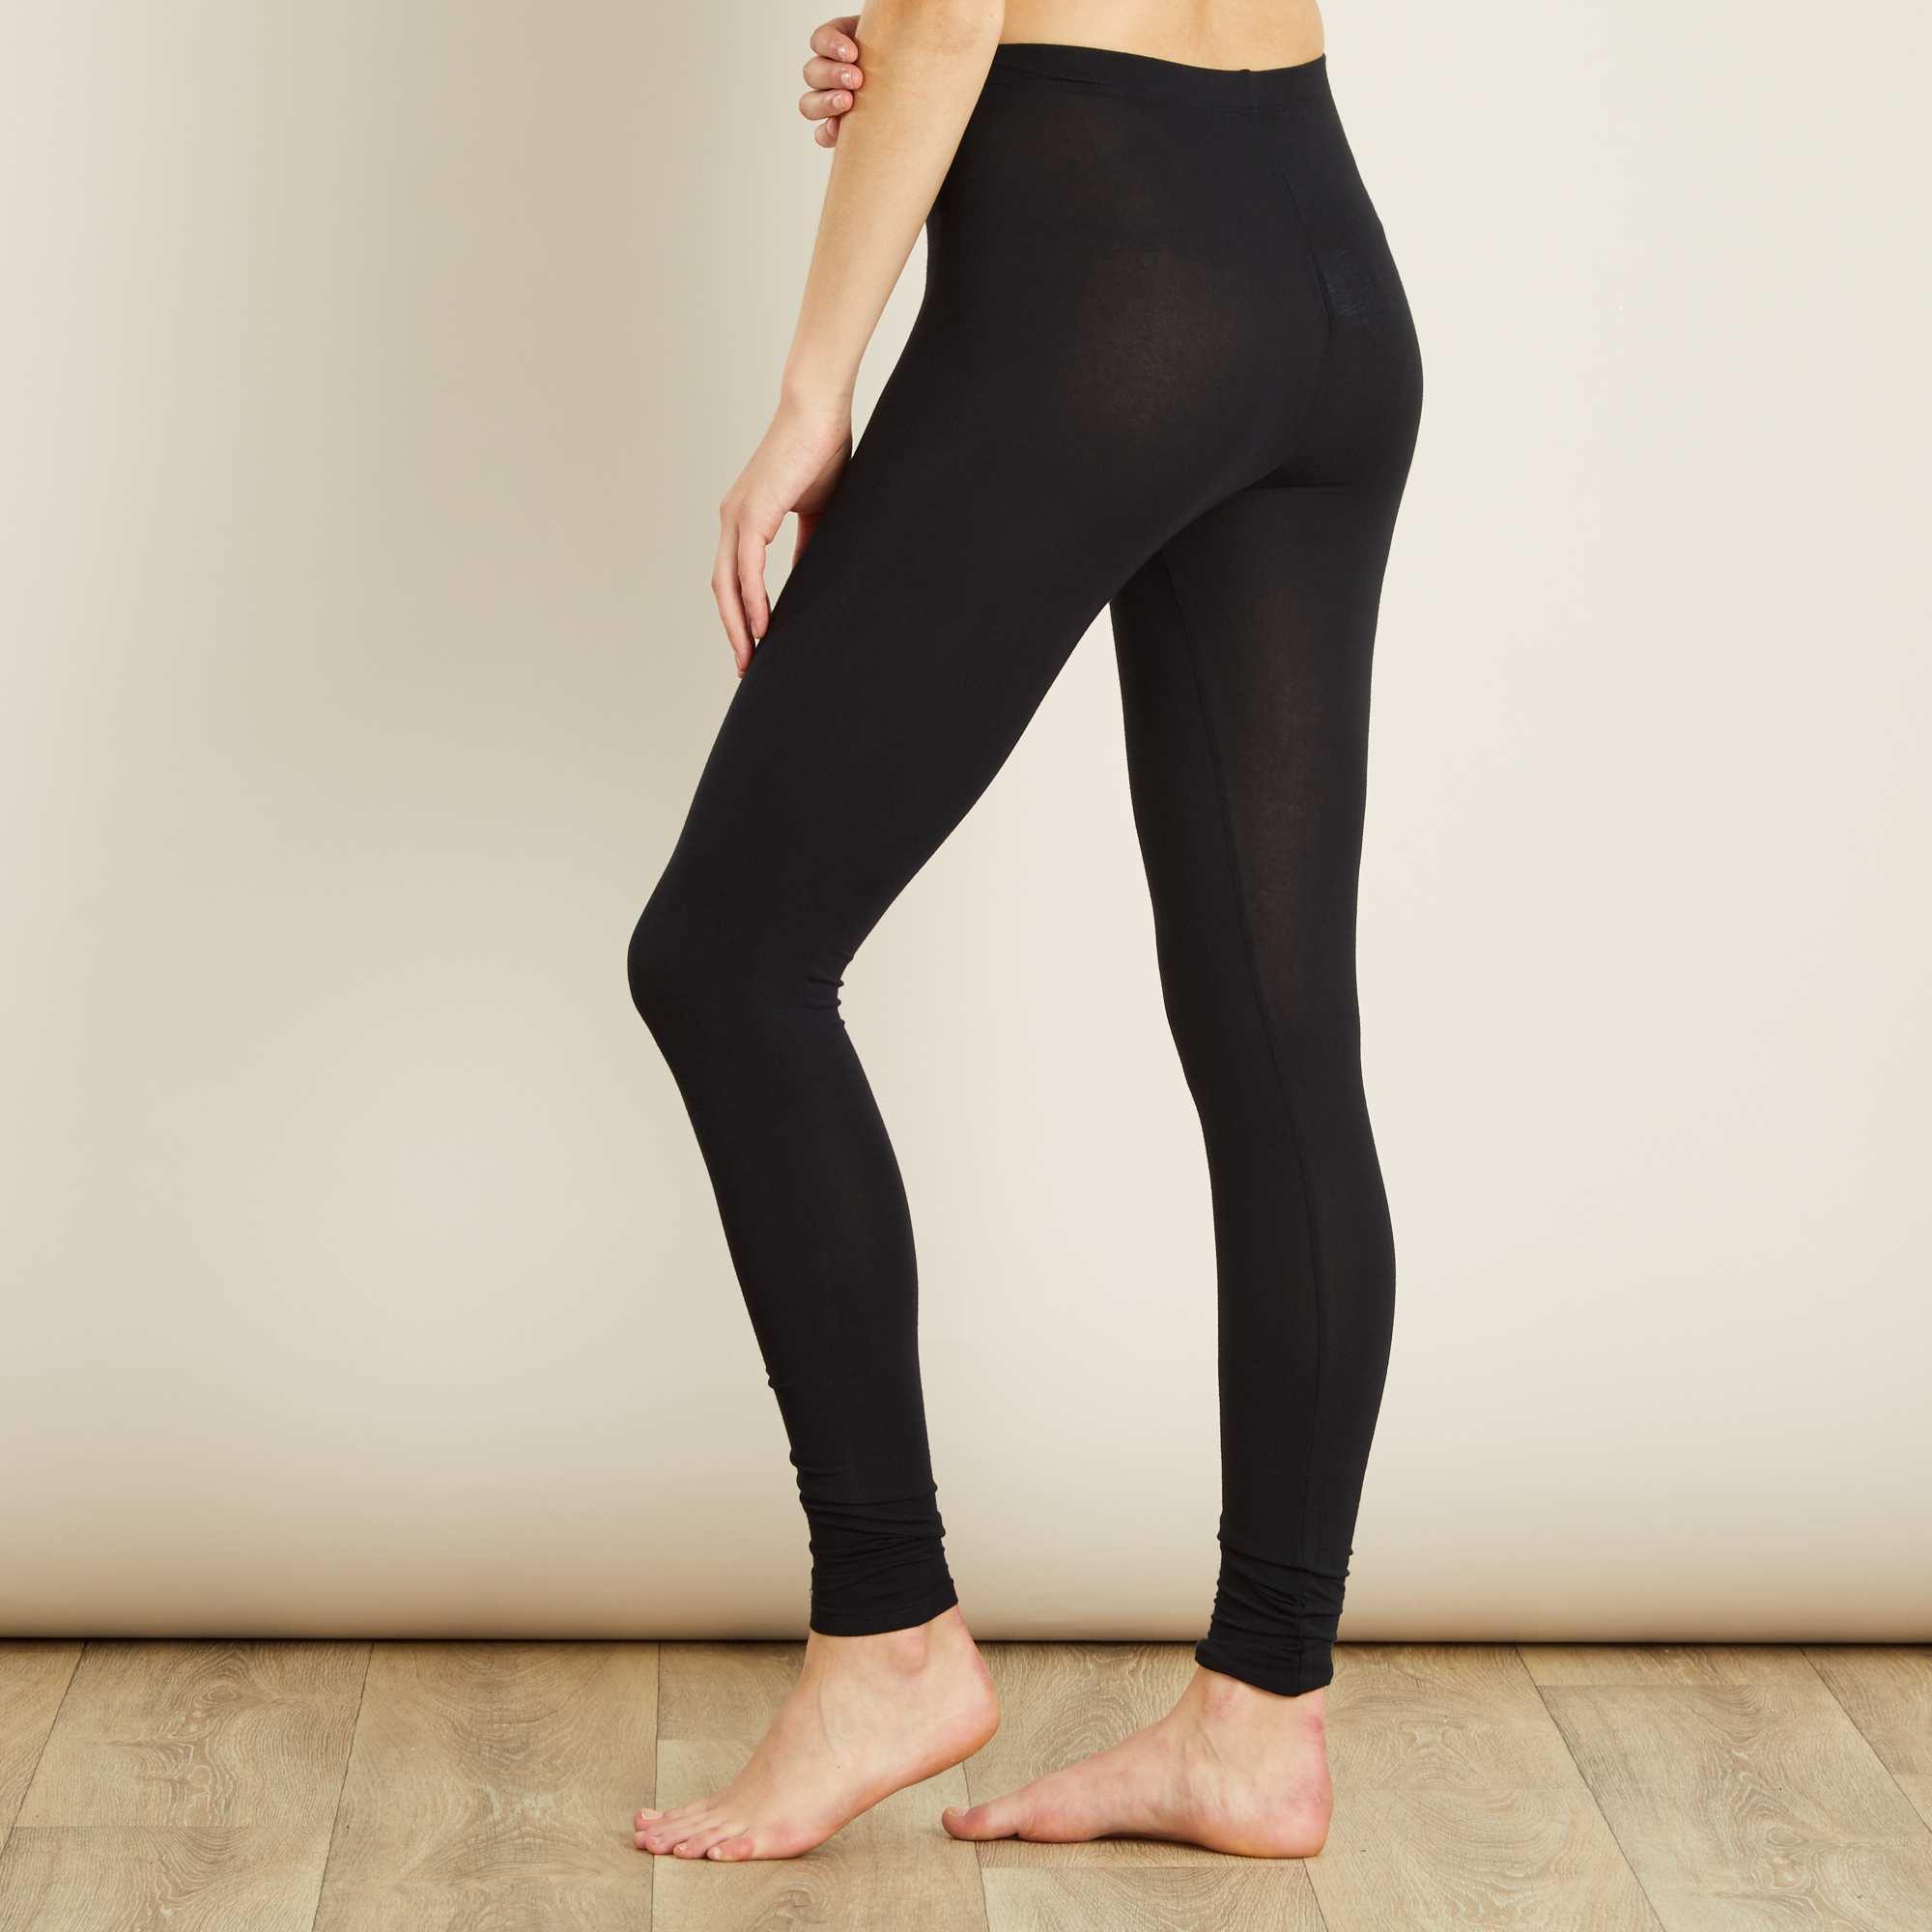 Accueil Femme Legging long Legging stretch